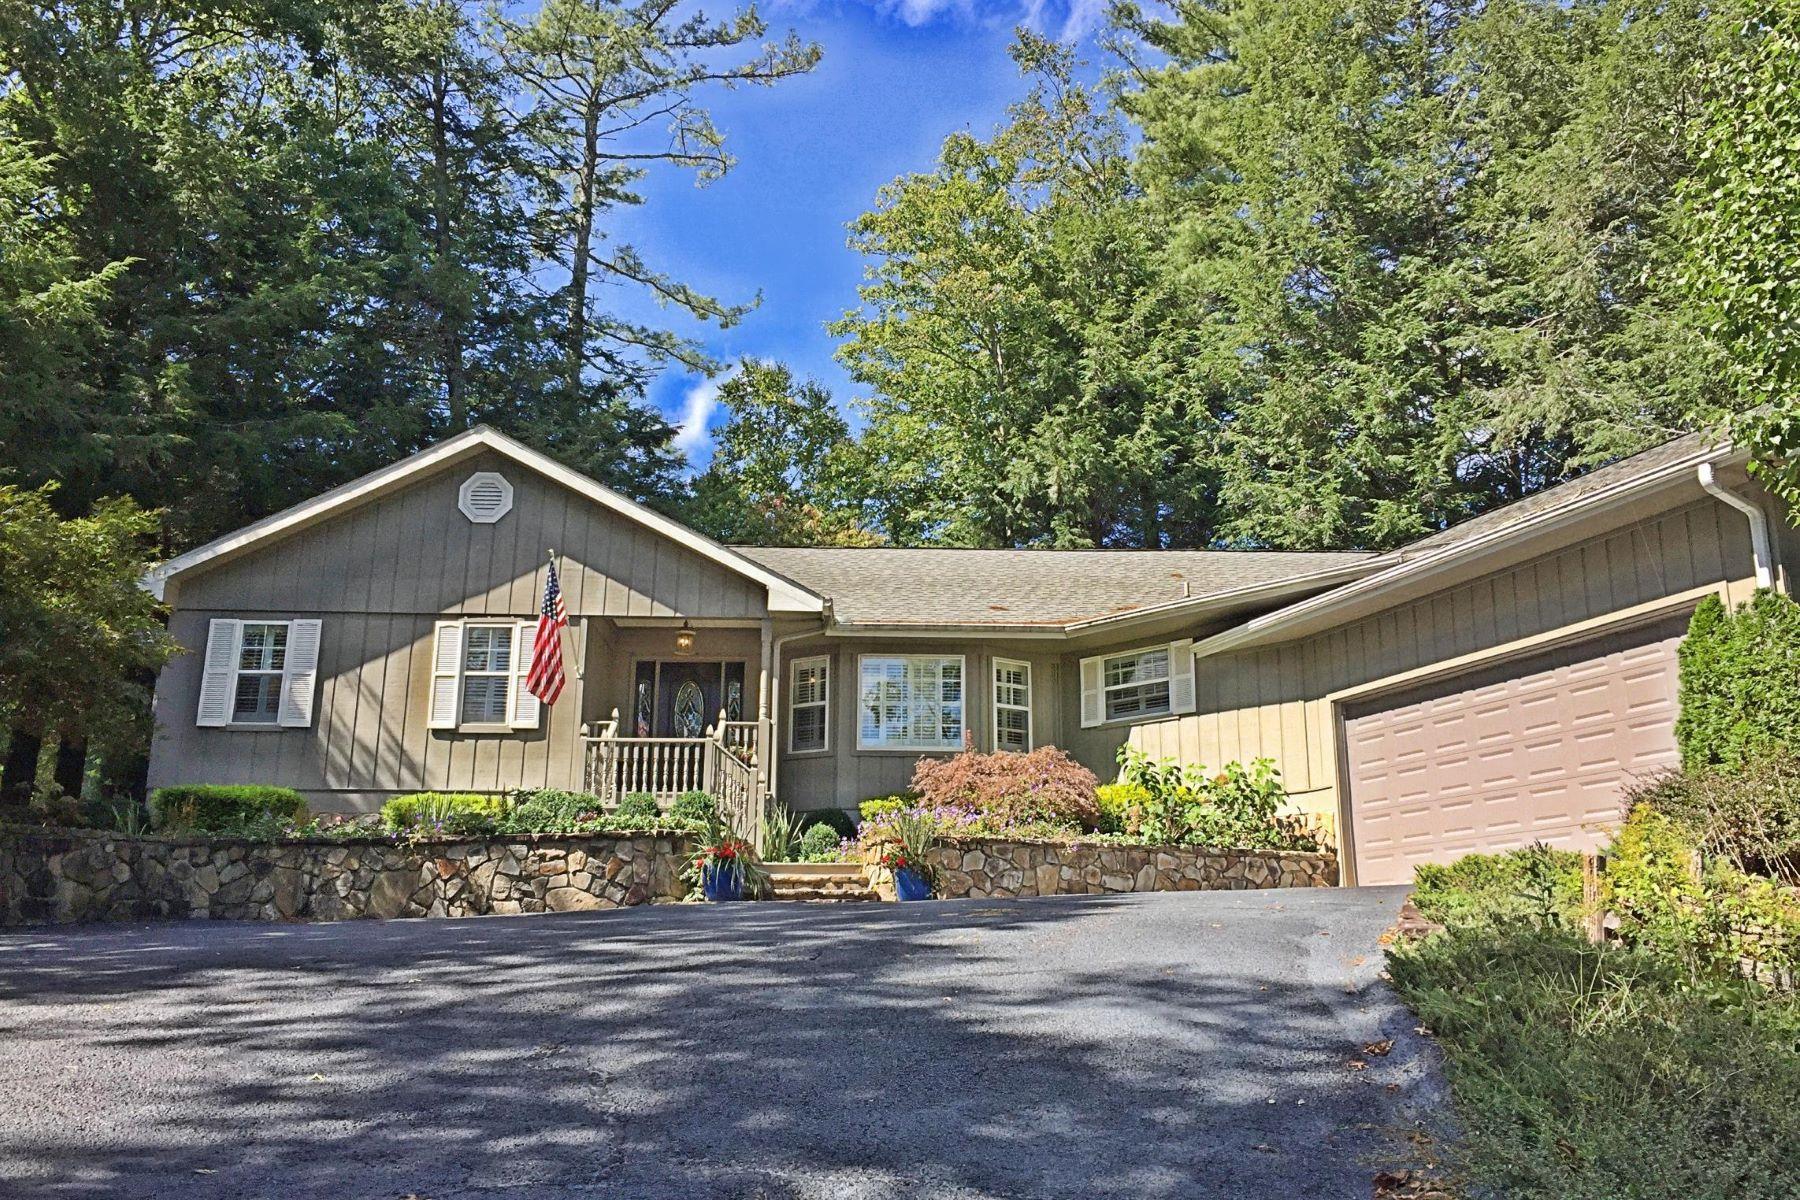 Single Family Home for Sale at Crosby 910 Skylake Drive Highlands, North Carolina, 28741 United States